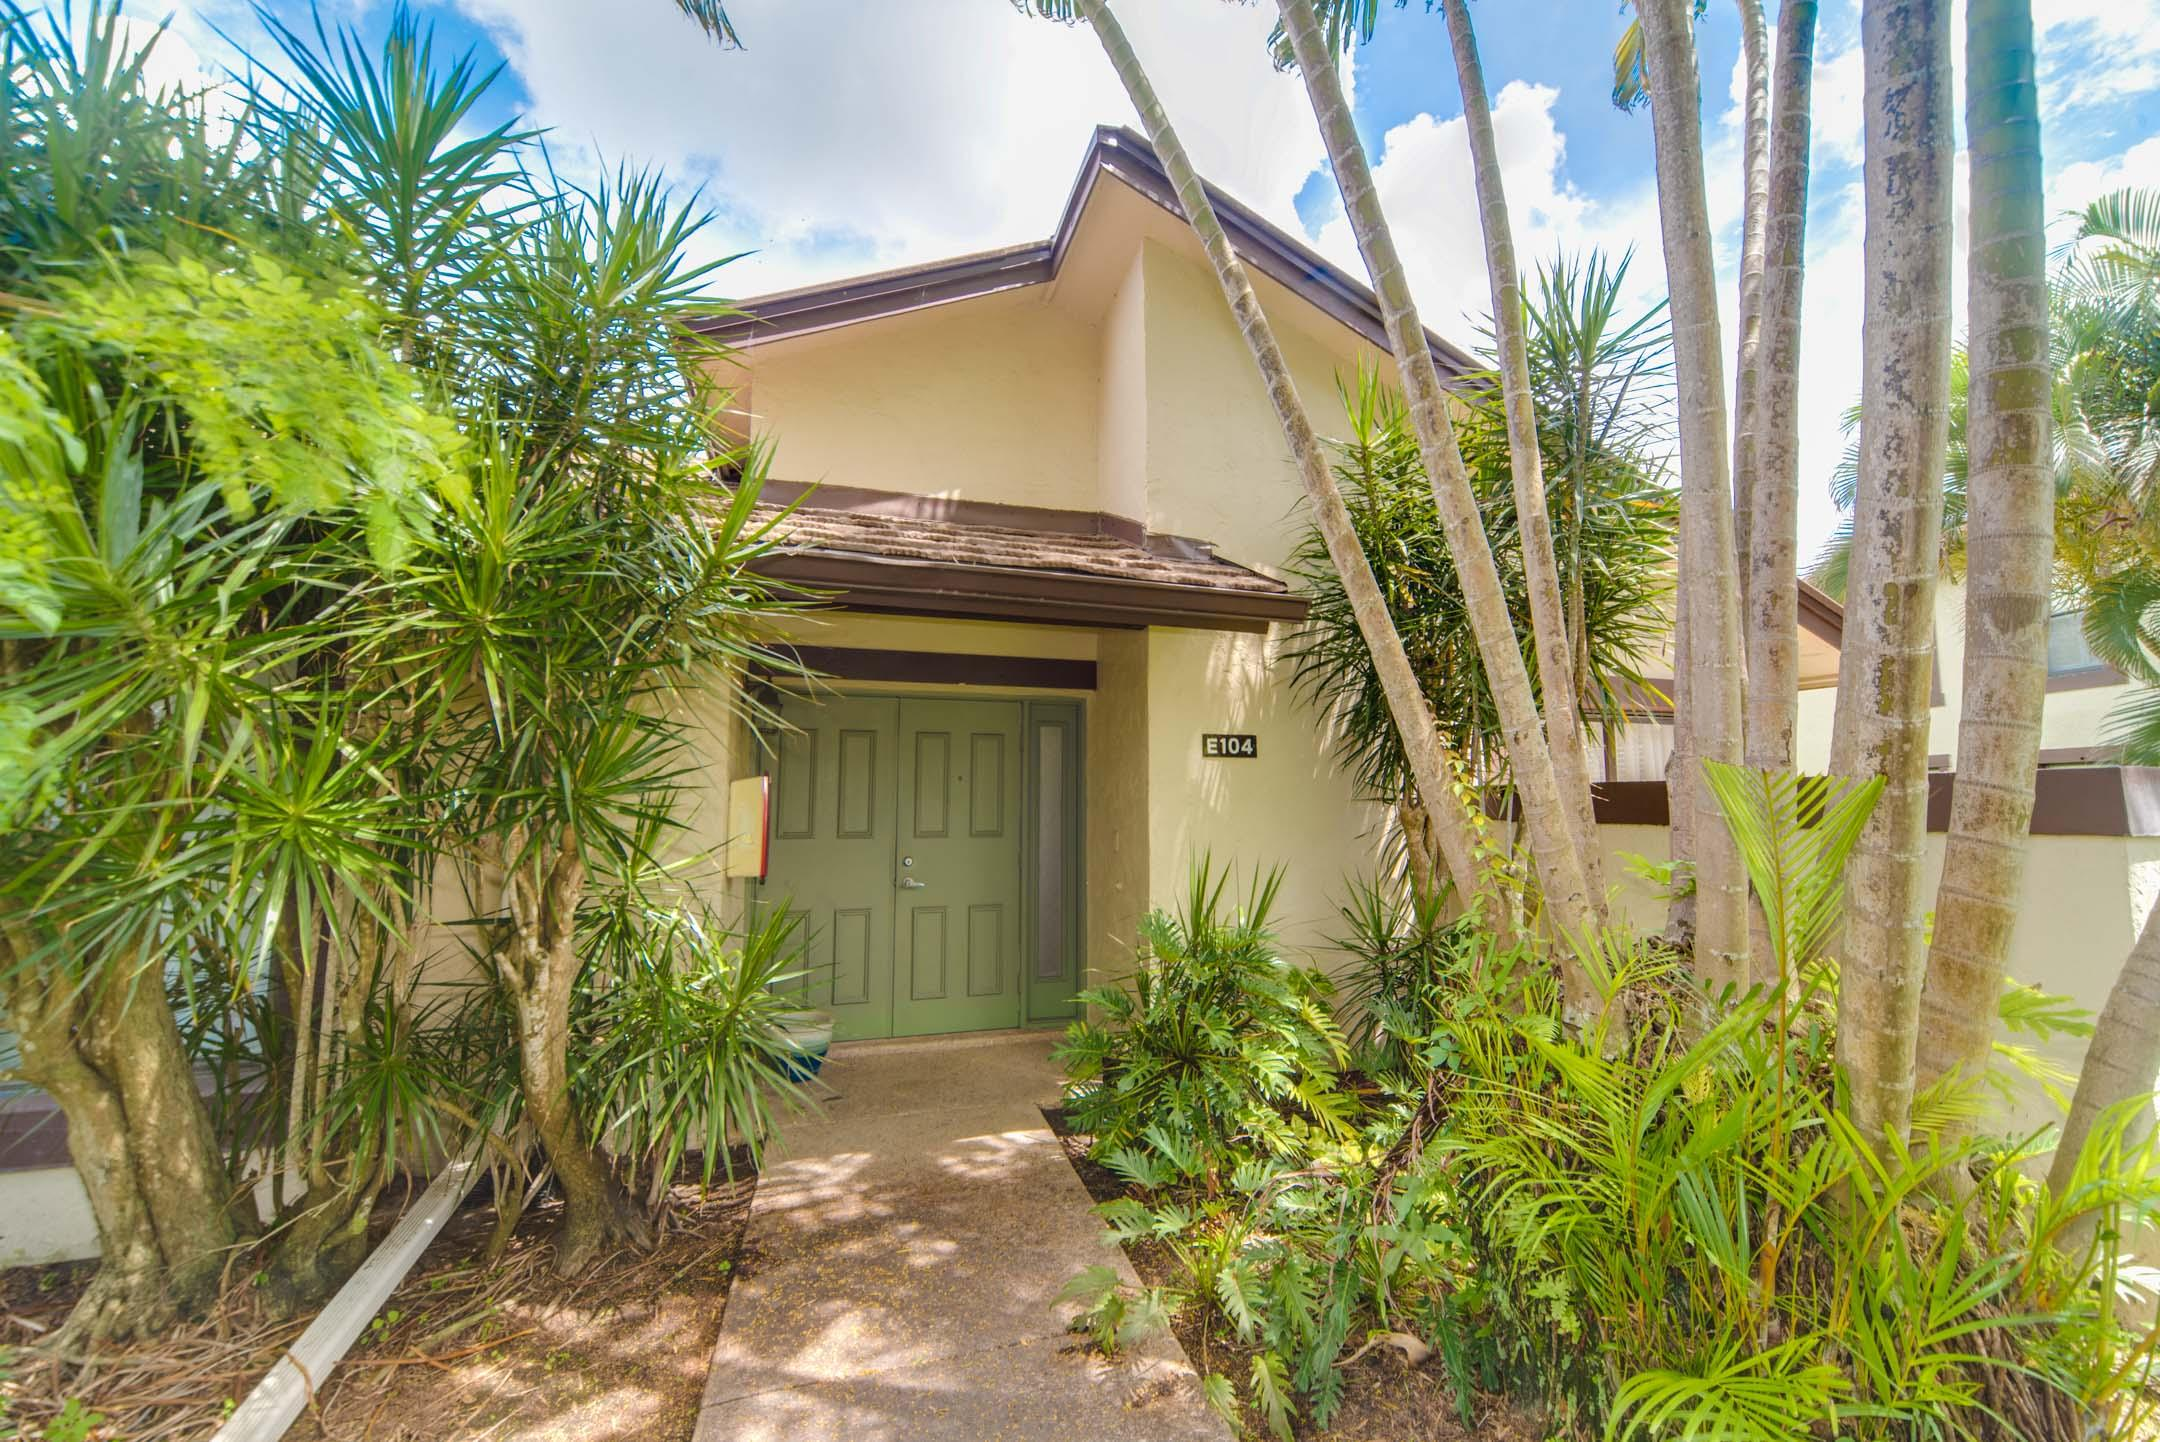 11397 Pond View Drive, Wellington, Florida 33414, 3 Bedrooms Bedrooms, ,3 BathroomsBathrooms,Condo/Coop,For Rent,Pond View,1,RX-10548774